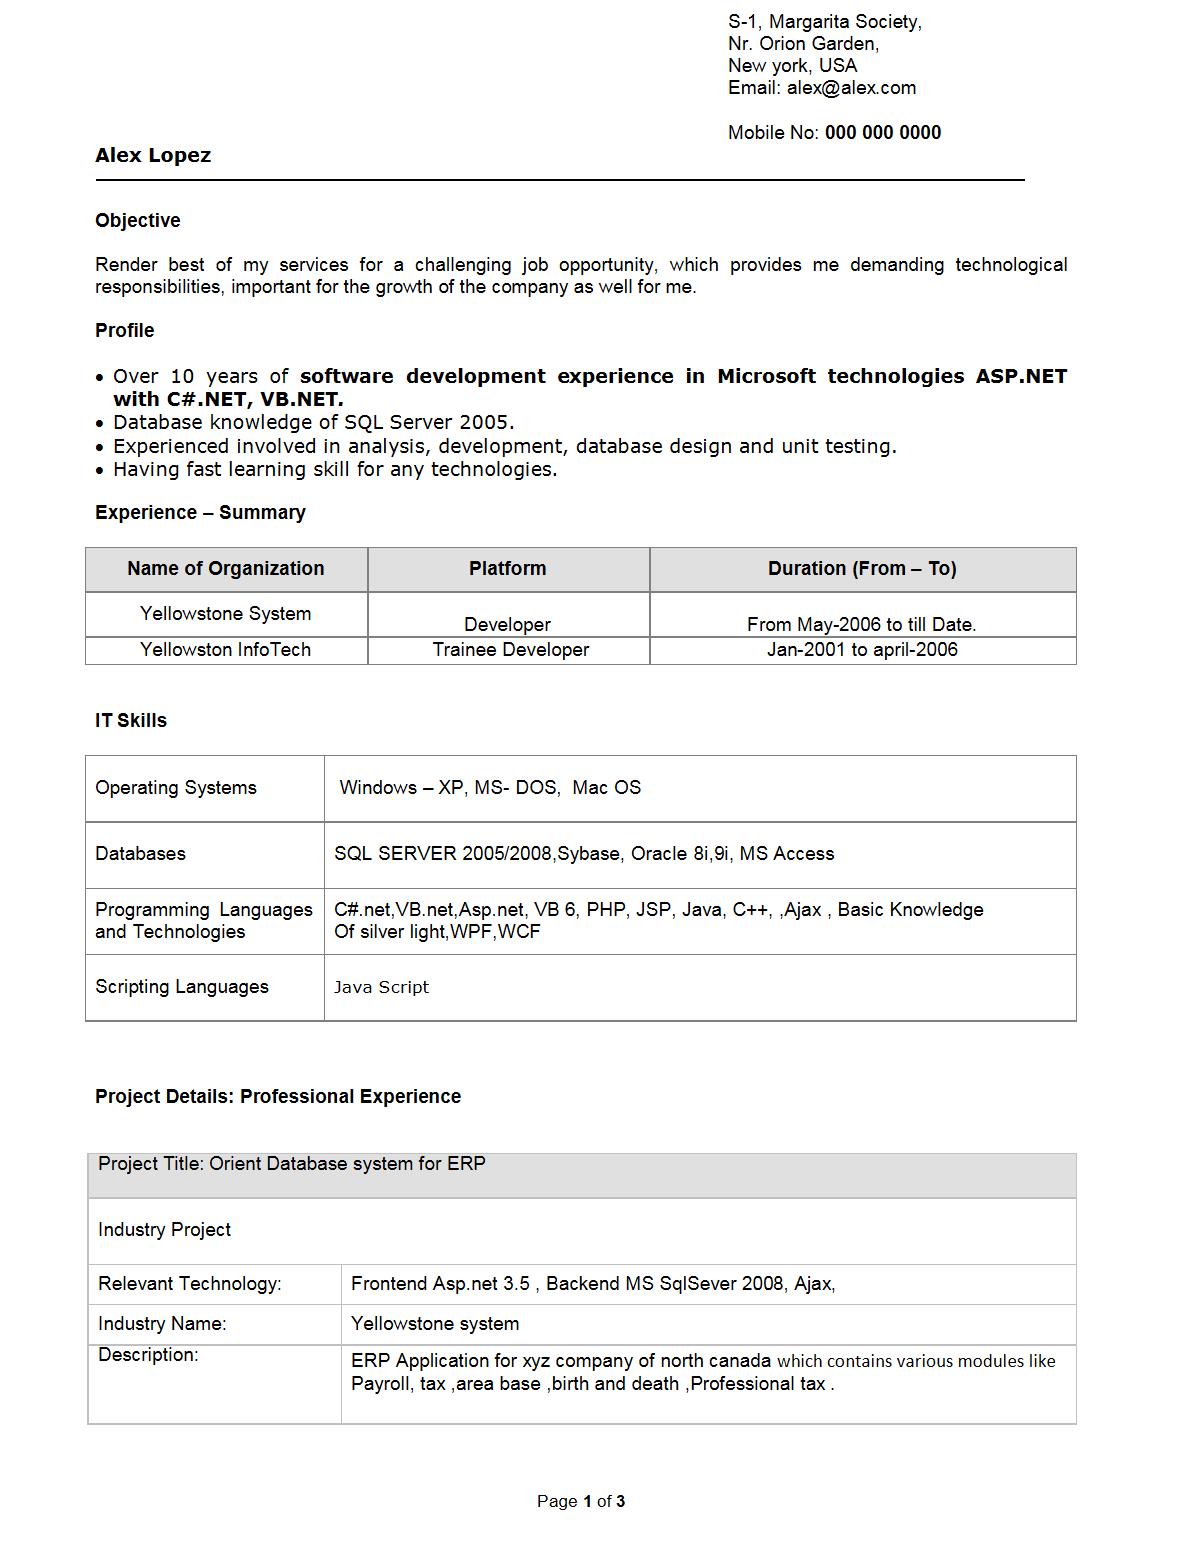 P G Resume Format Job resume samples, Resume format, Job